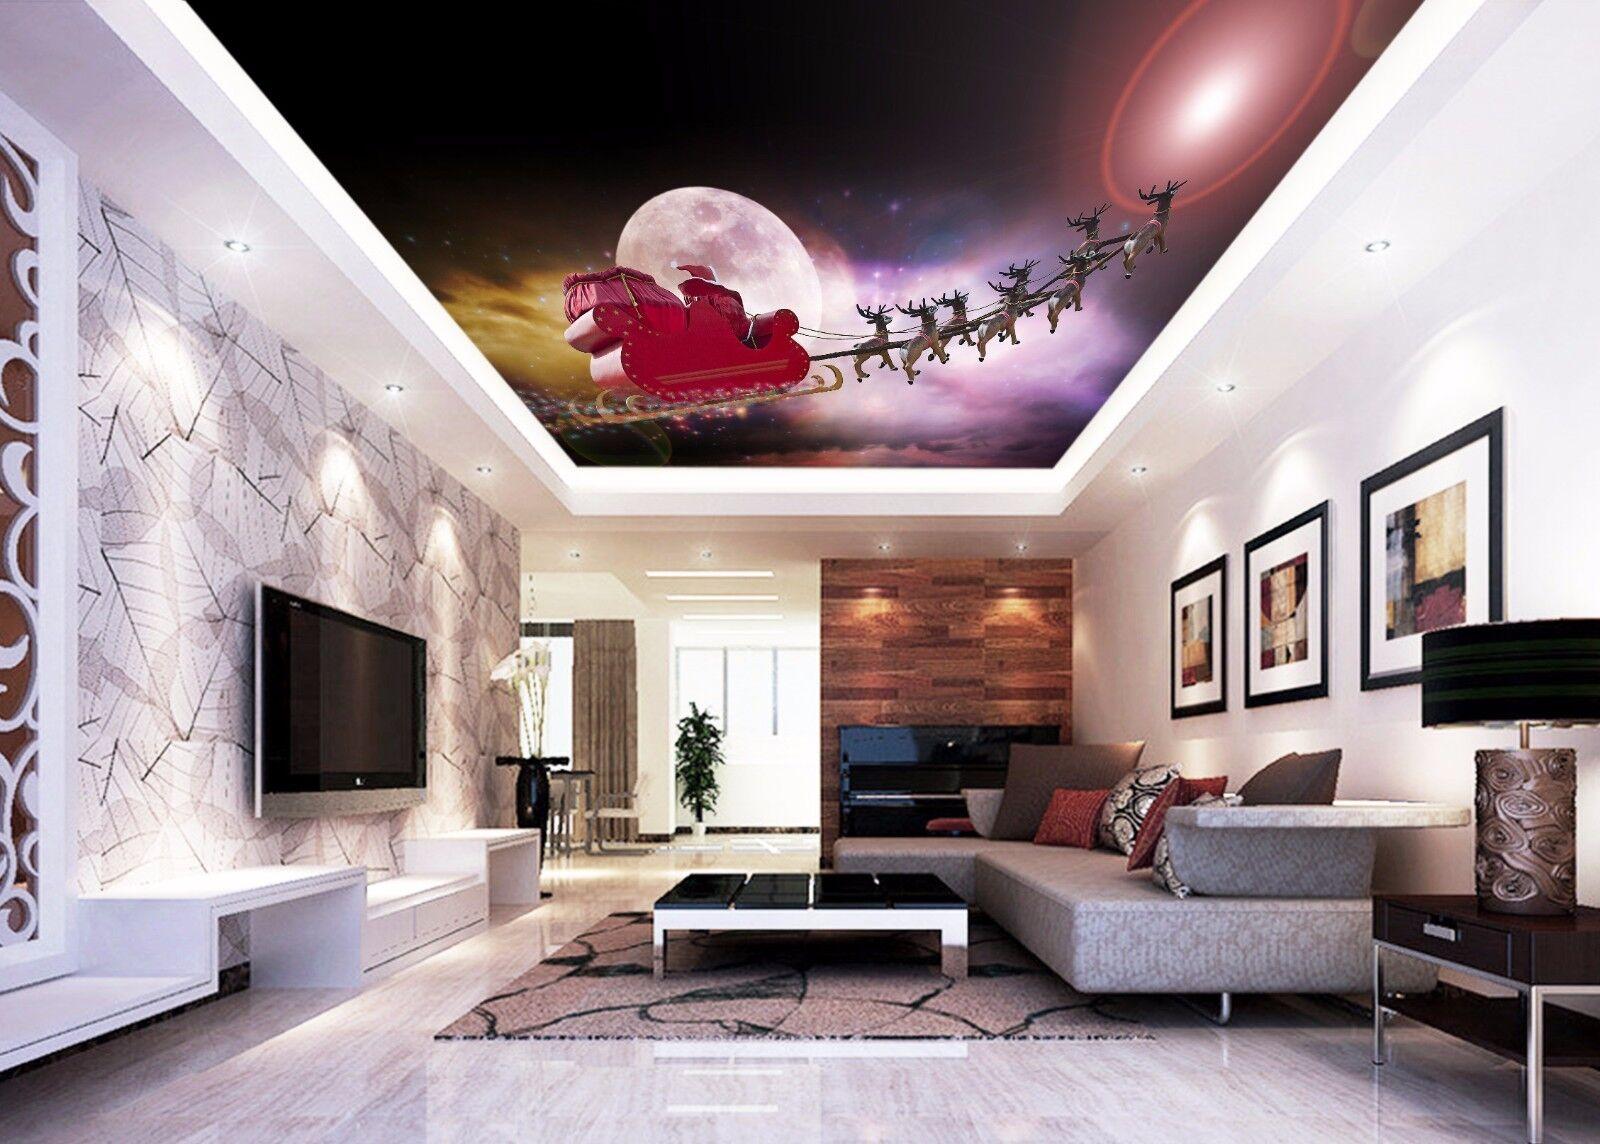 3D Moon Sky  Deer 75 Ceiling WallPaper Murals Wall Print Decal Deco AJ WALLPAPER